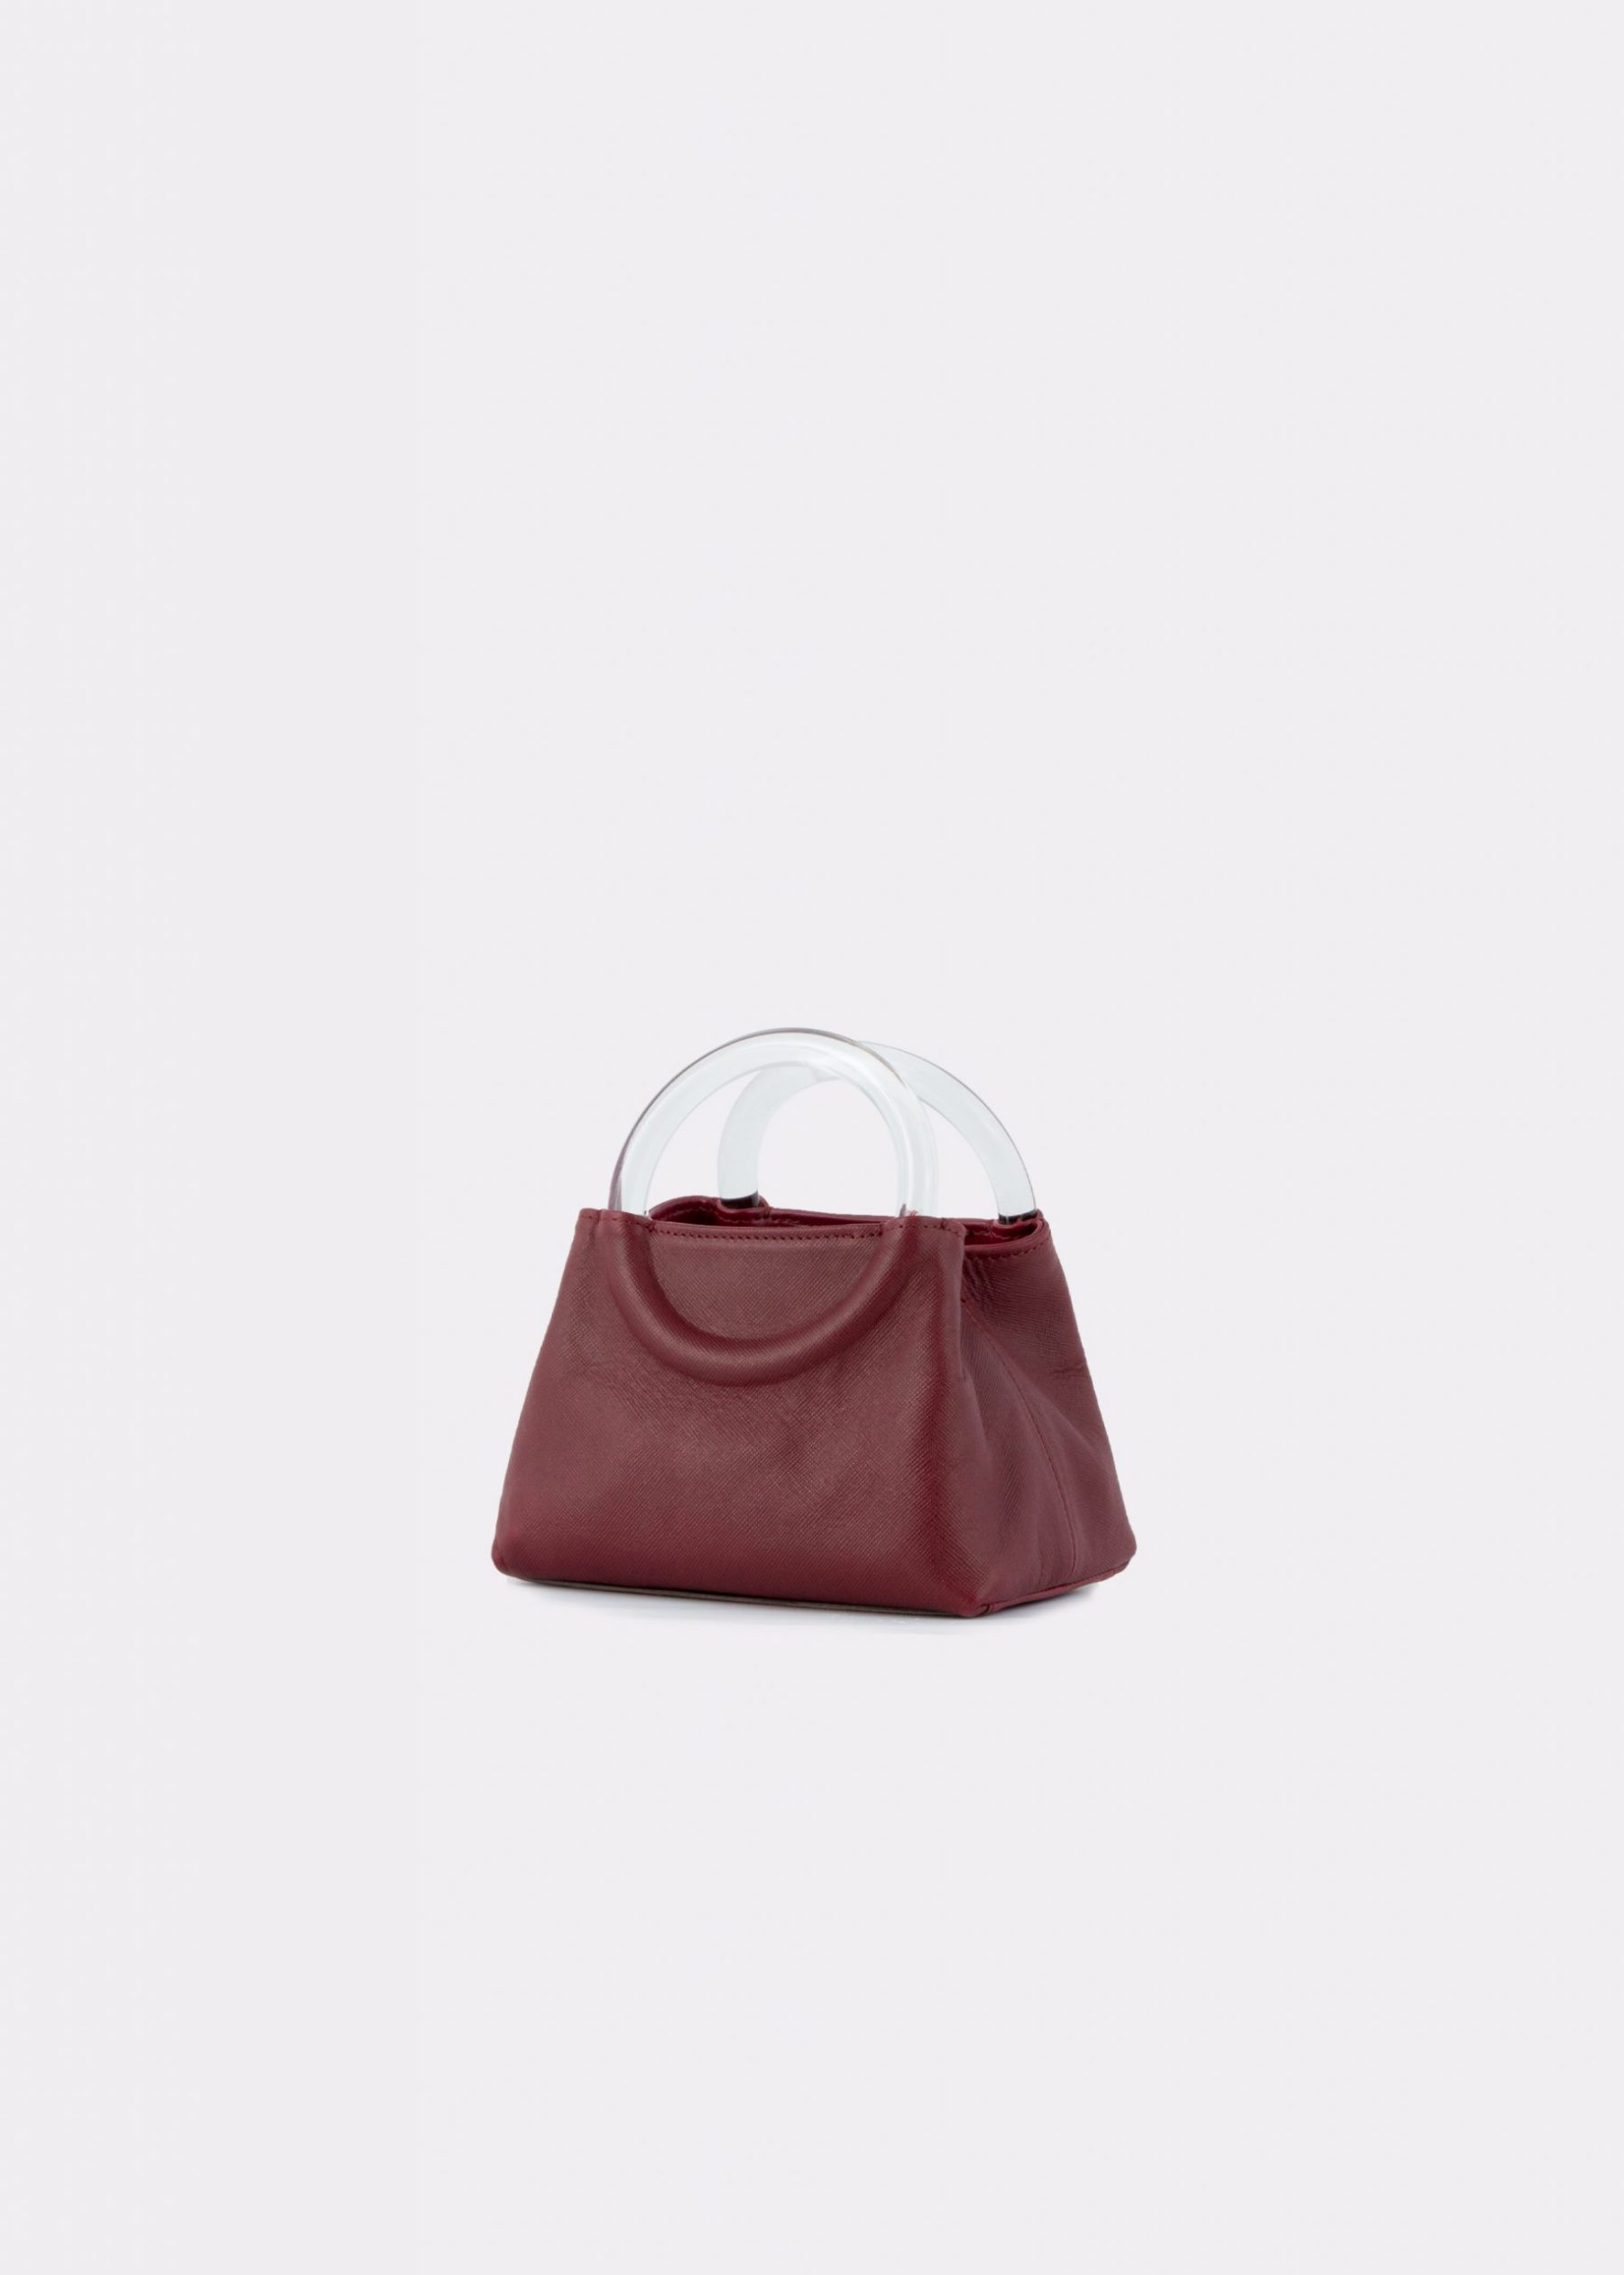 NIDO-Bolla_Micro-bag-bordeaux_side view